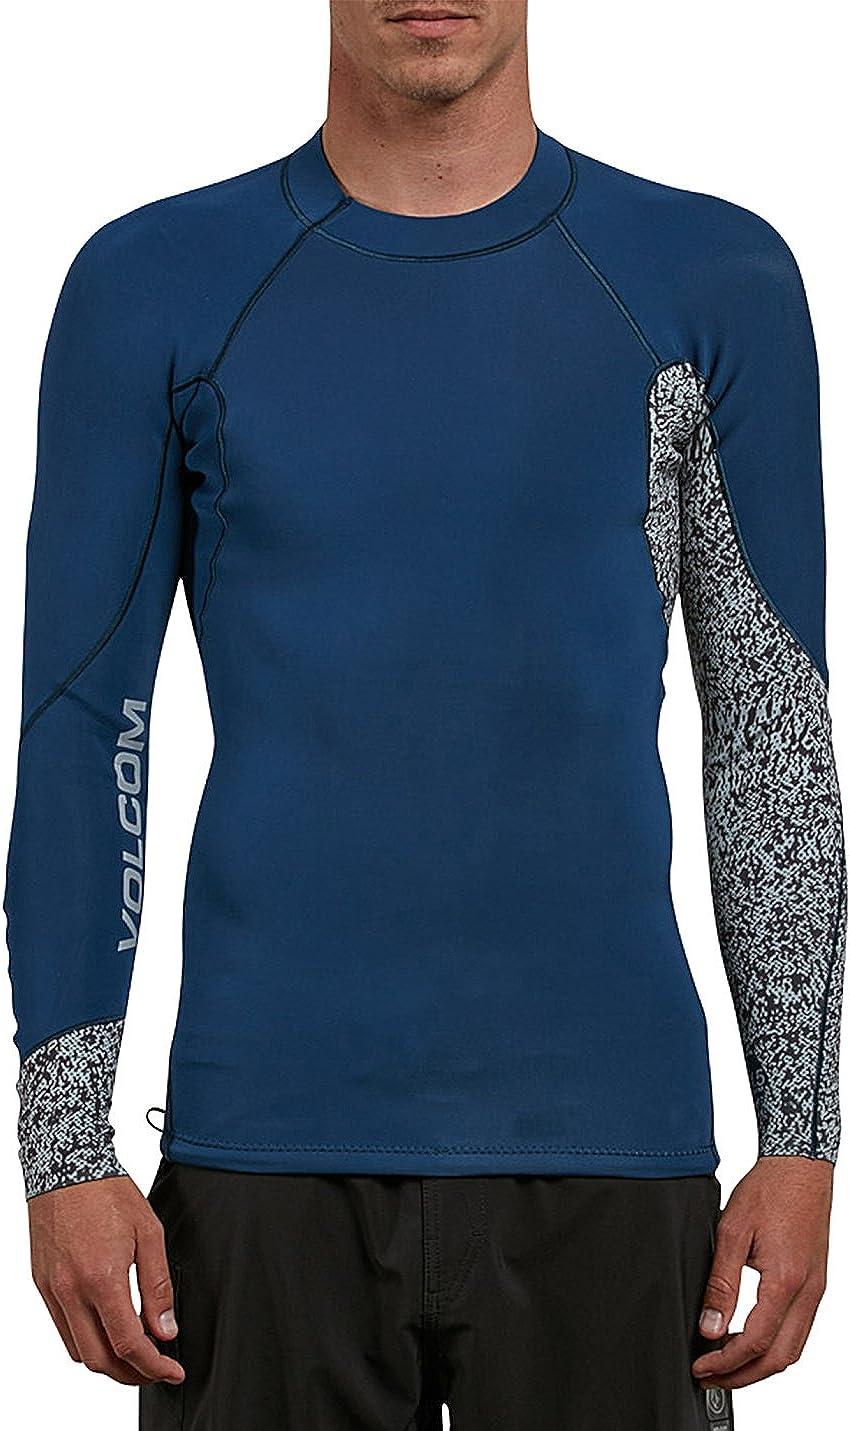 Volcom Men's Neo Revo Wetsuit Jacket